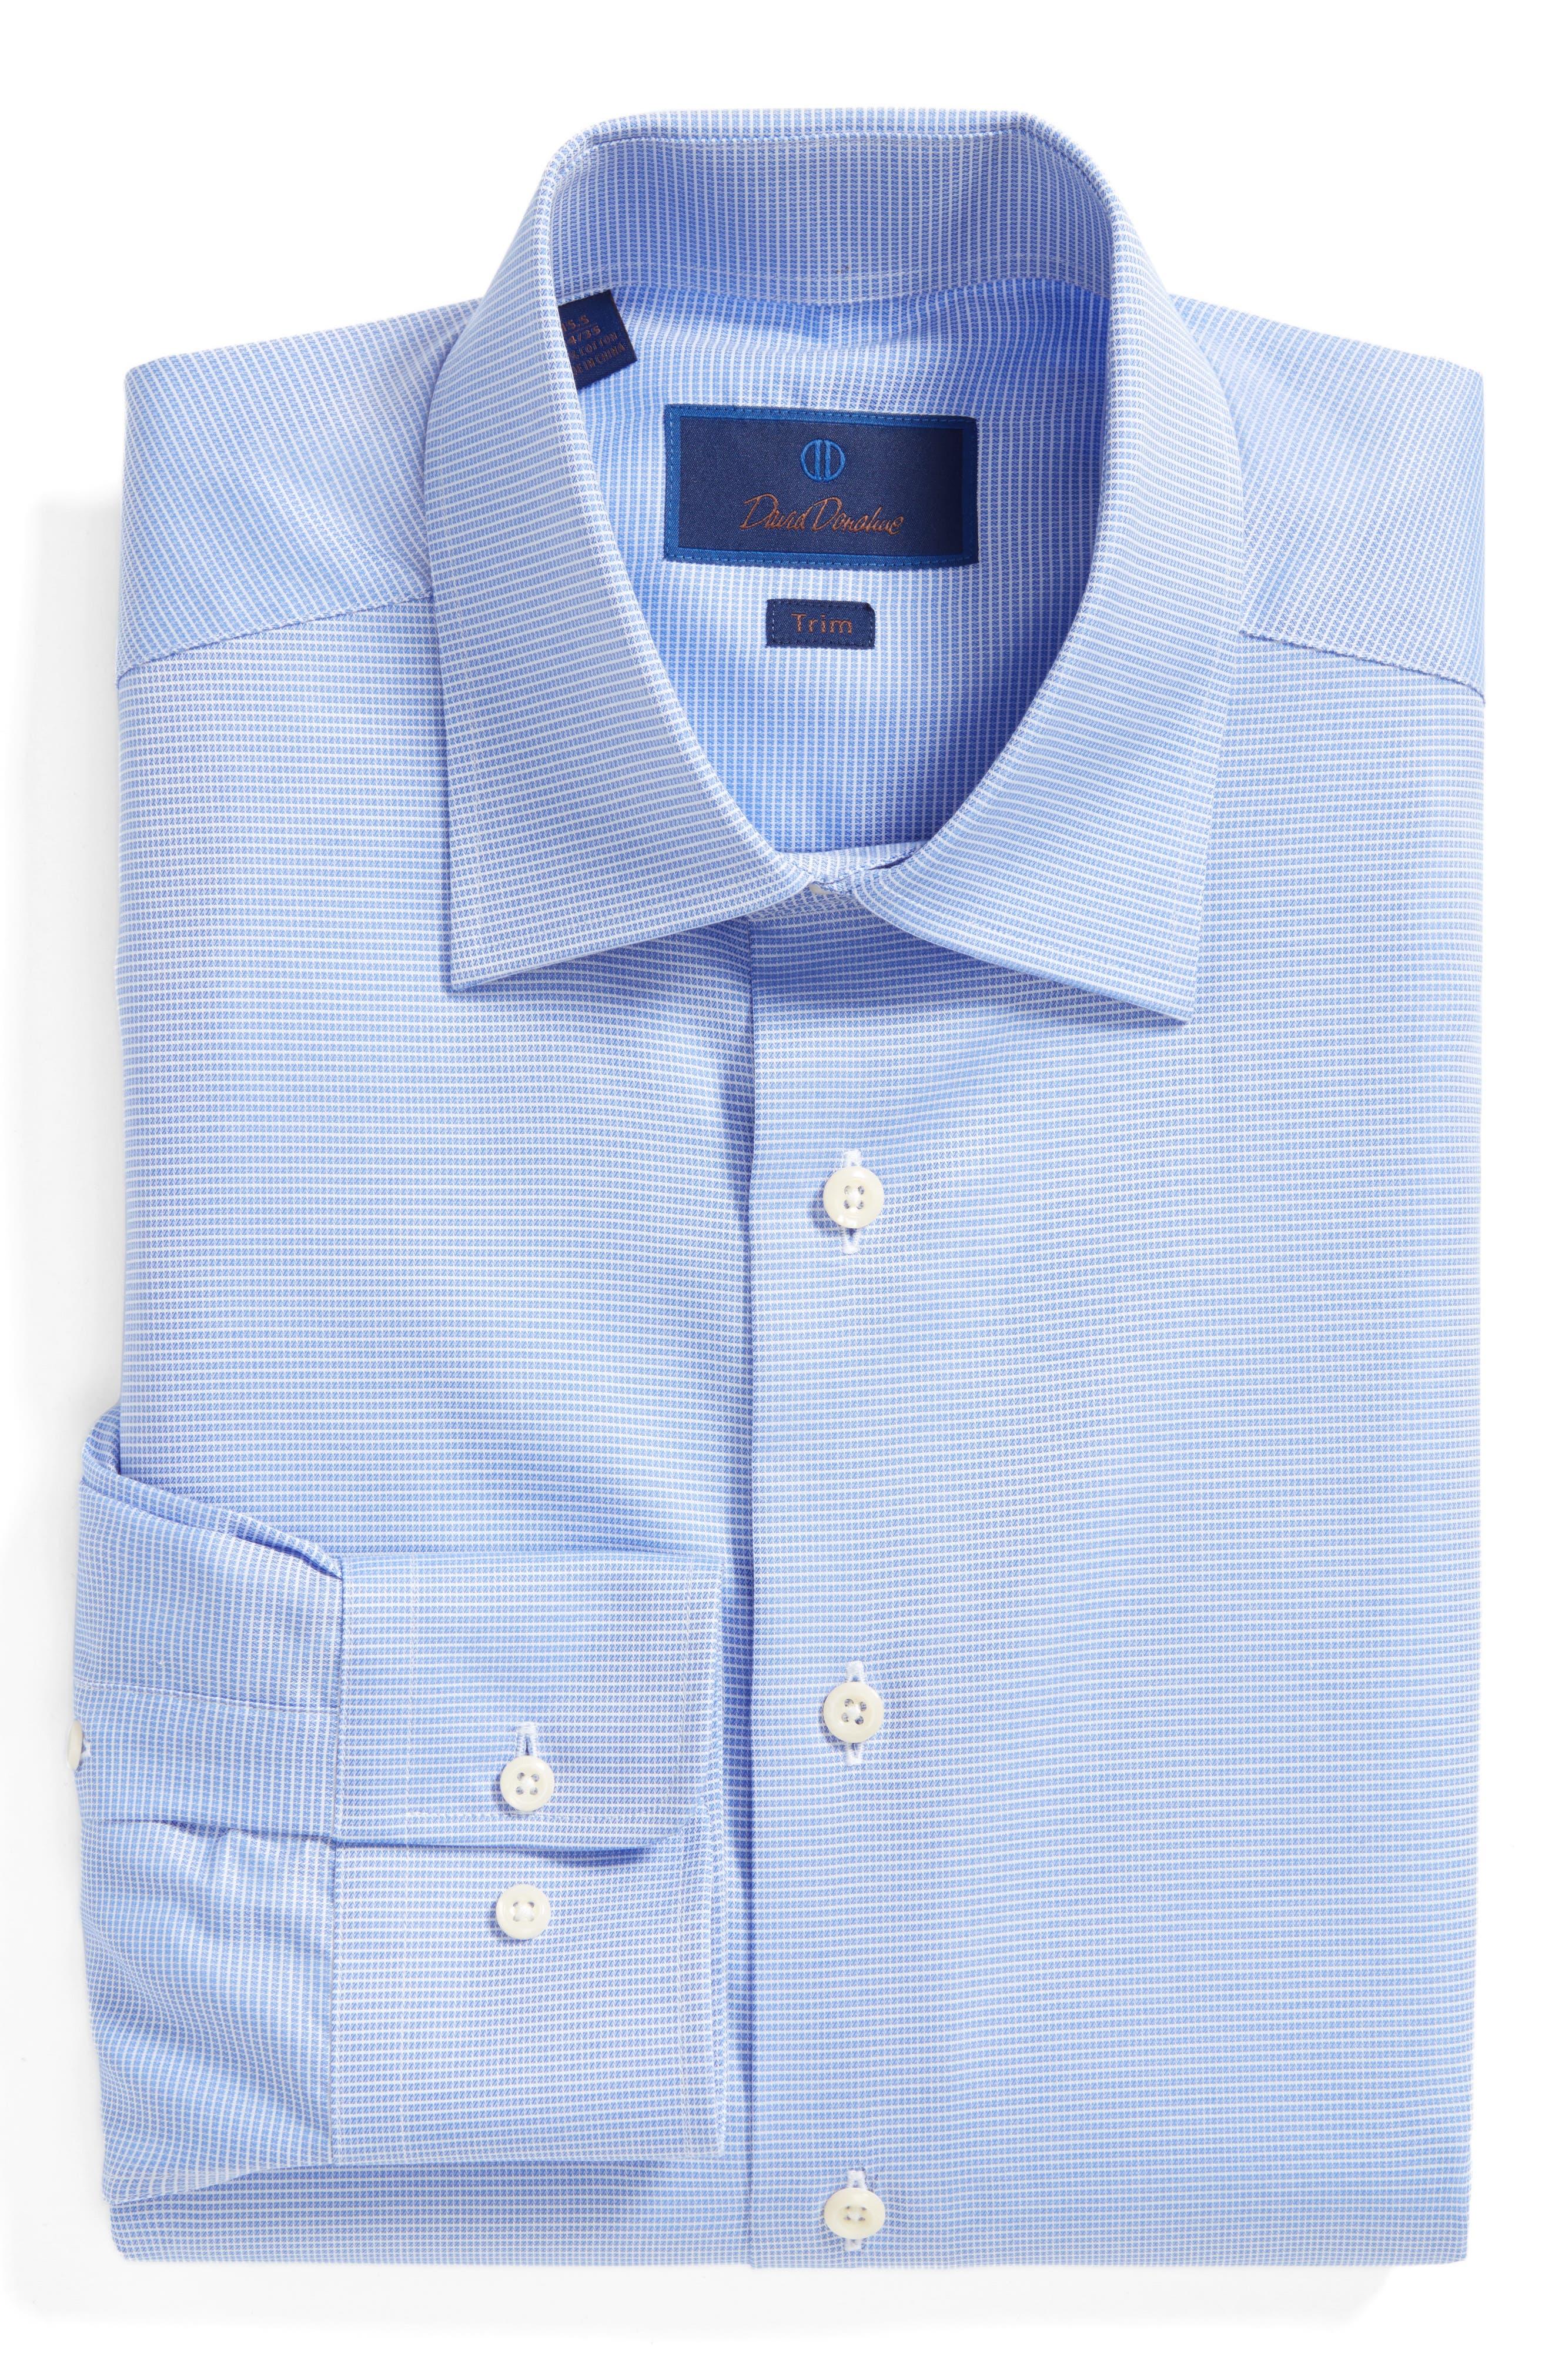 David Donahue Trim Fit Microcheck Dress Shirt